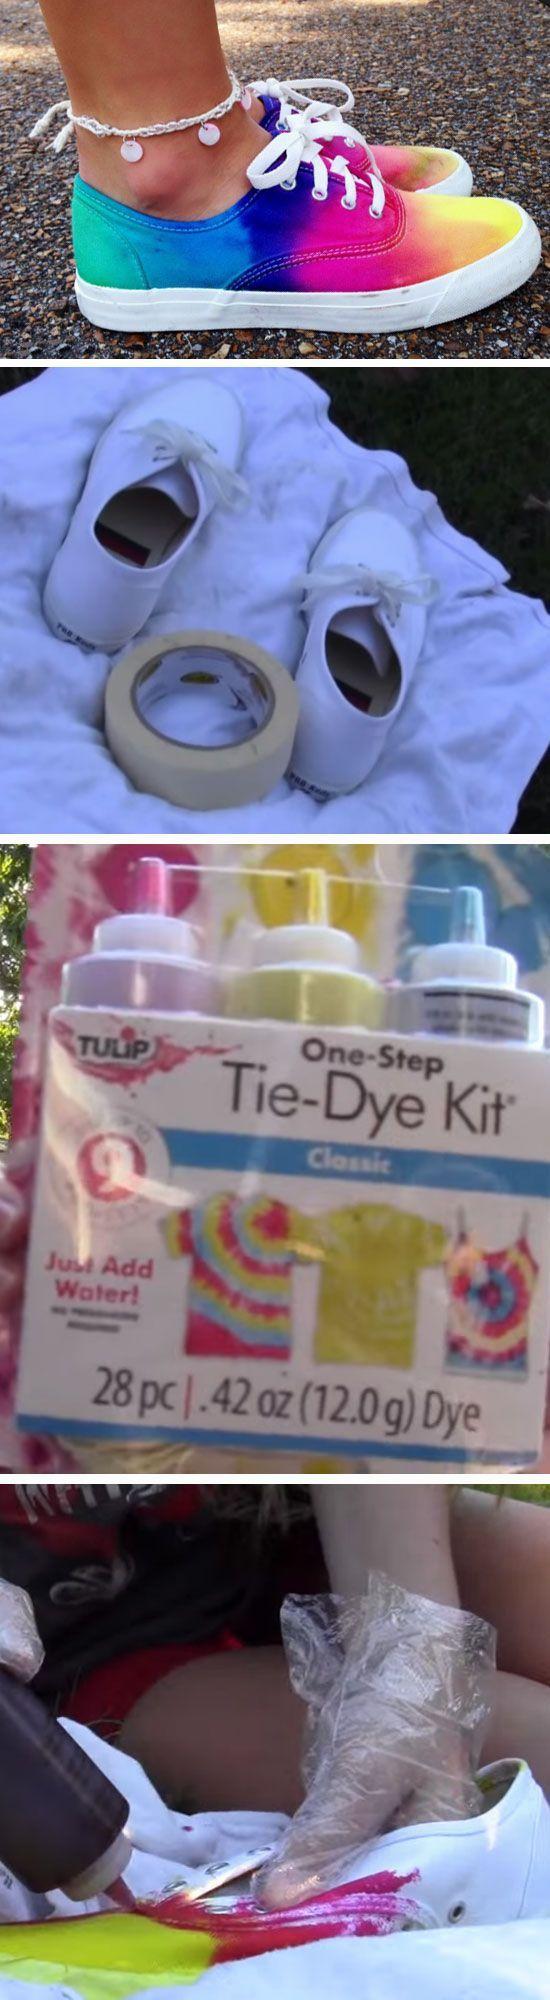 Multicolored Shoes | 15 Easy DIY Tie Dye Projects Ideas that will bring out your inner hippie! alles für Ihren Erfolg - www.ratsucher.de